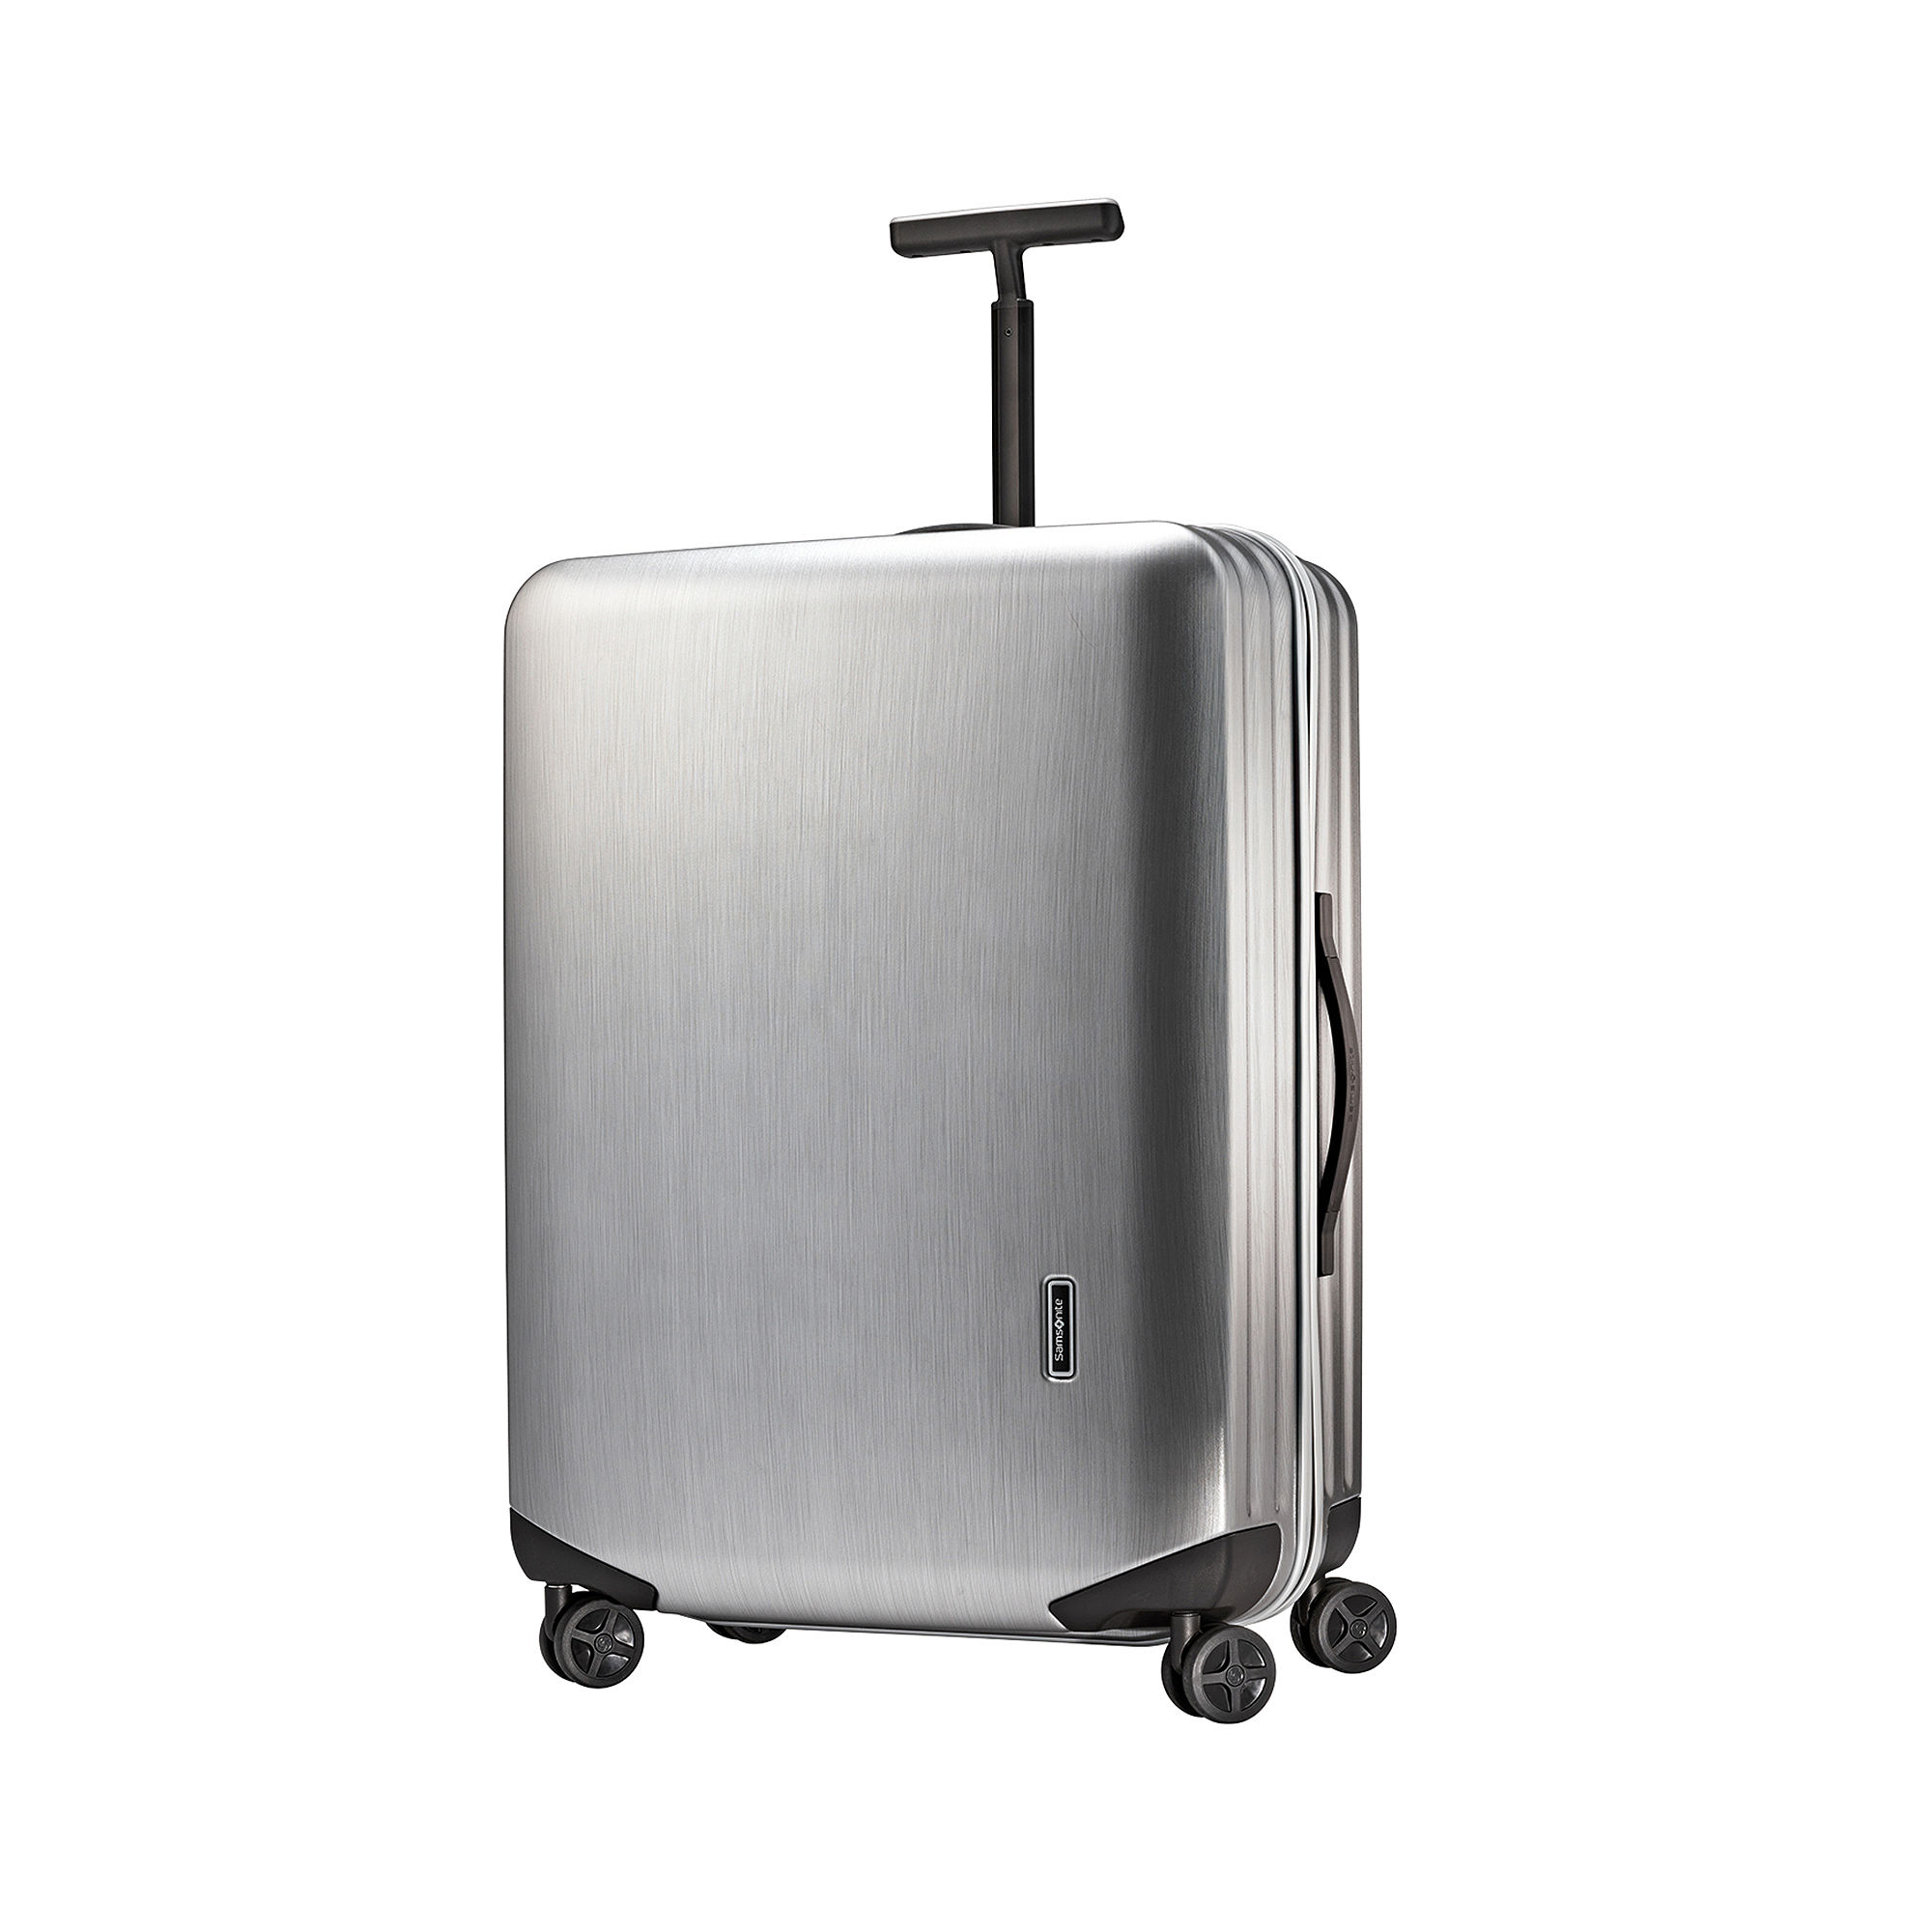 "Samsonite Inova 28"" Hardside Upright Luggage"